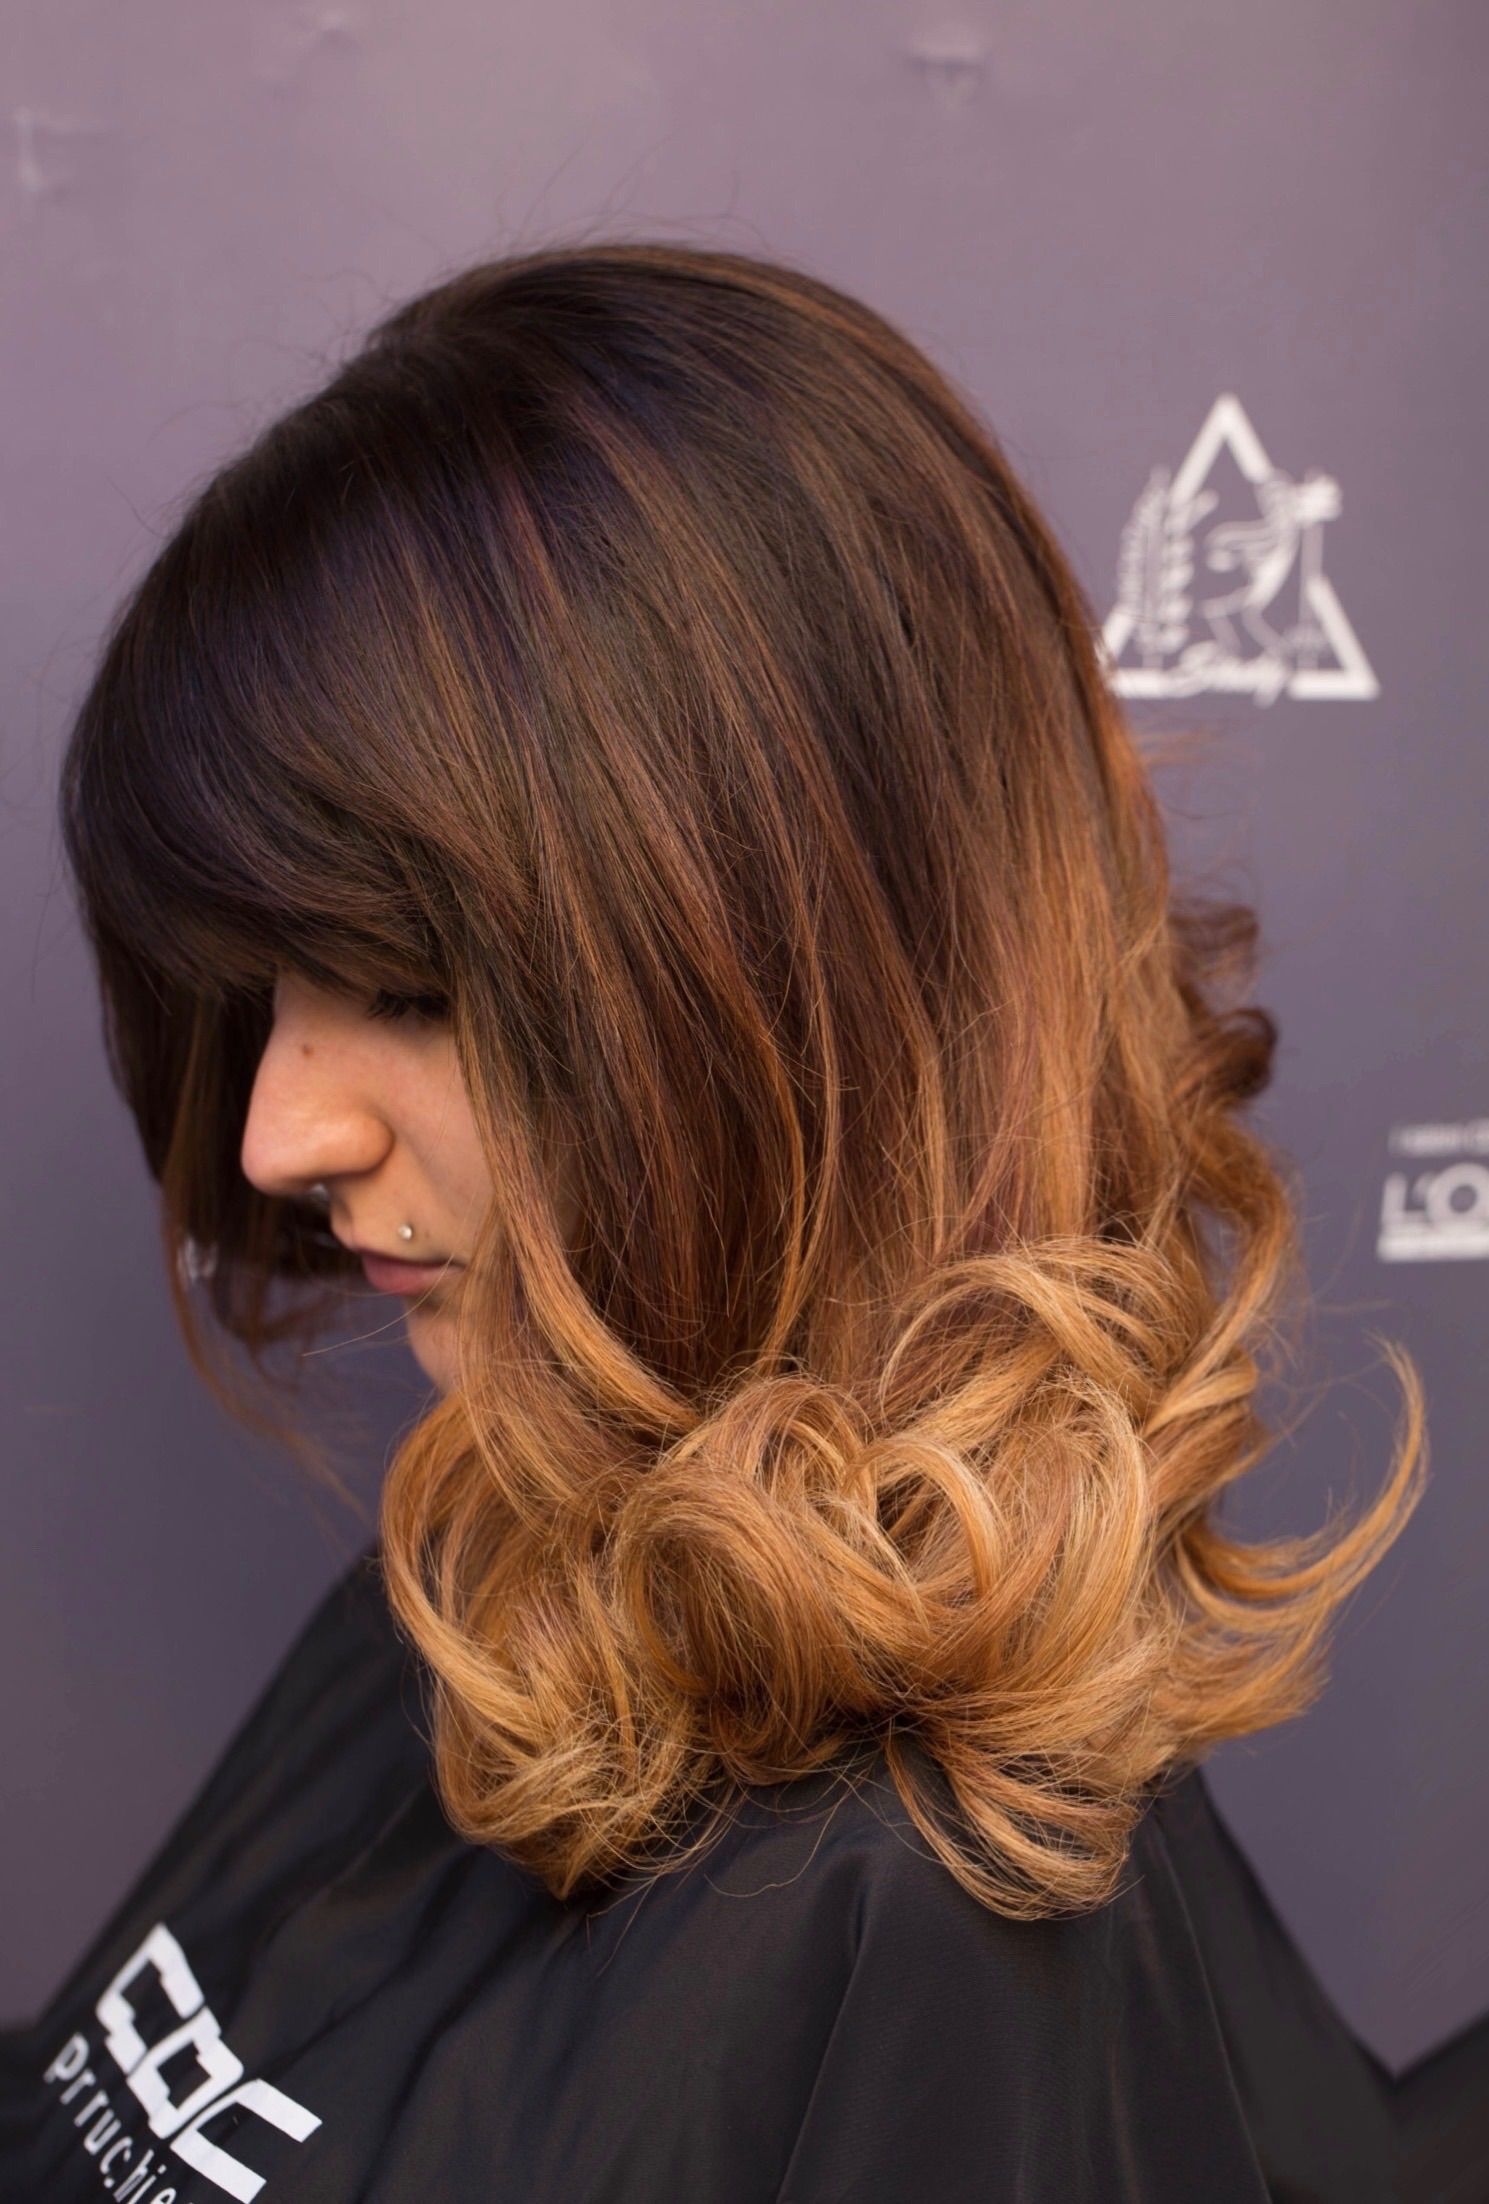 #Sfumaturechefannoladifferenza #VogueStudy #RoggianoGravina#HairFashion #haircare #DegradèConseil #http://www.degradeconseil.it/salon-finder